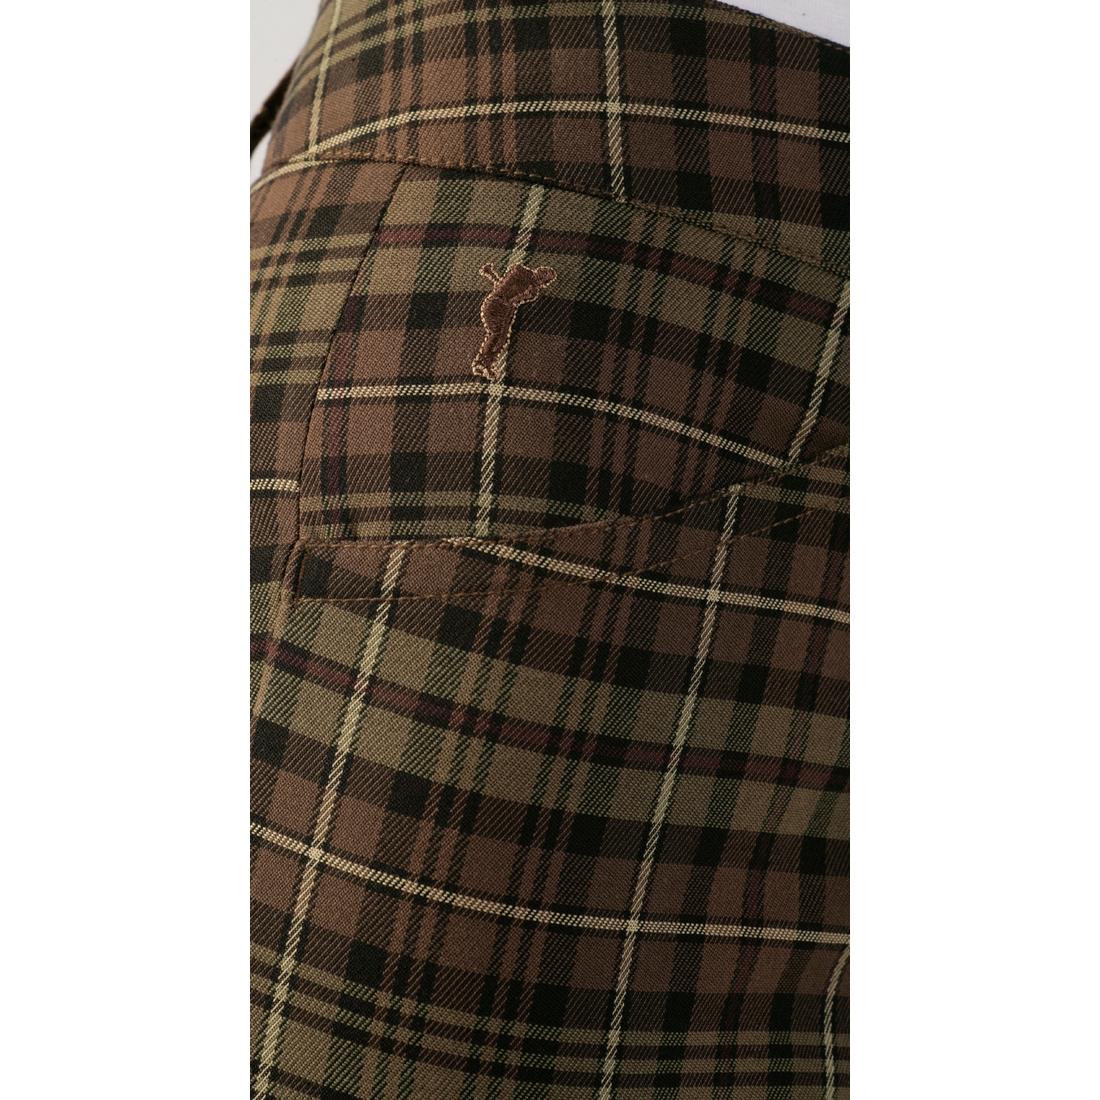 Damen Hose aus exklusivem Karostoff